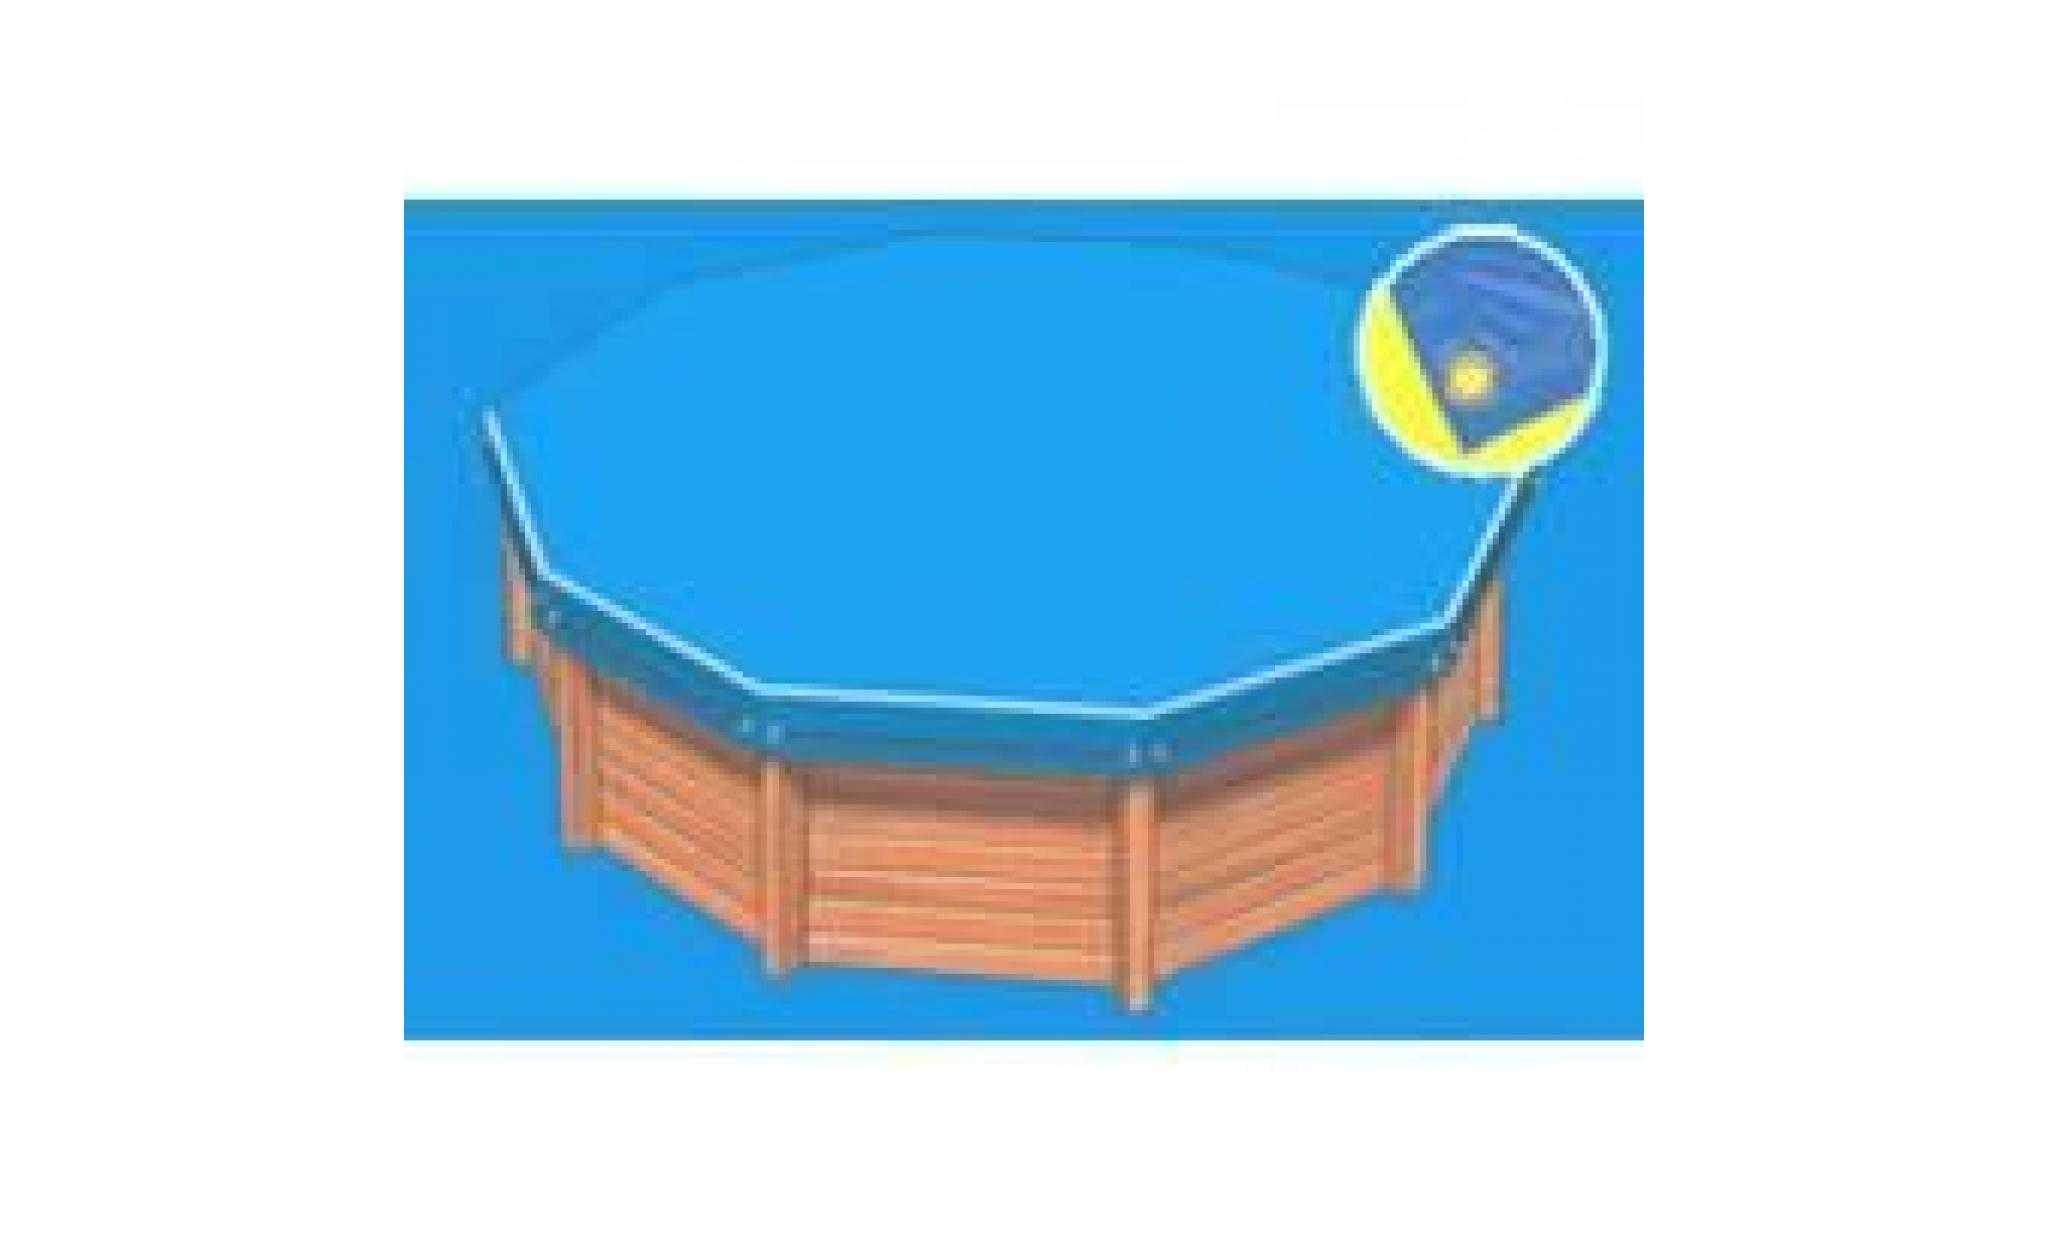 b che hiver luxe bleue pour piscine cristaline achat vente bache piscine pas cher. Black Bedroom Furniture Sets. Home Design Ideas